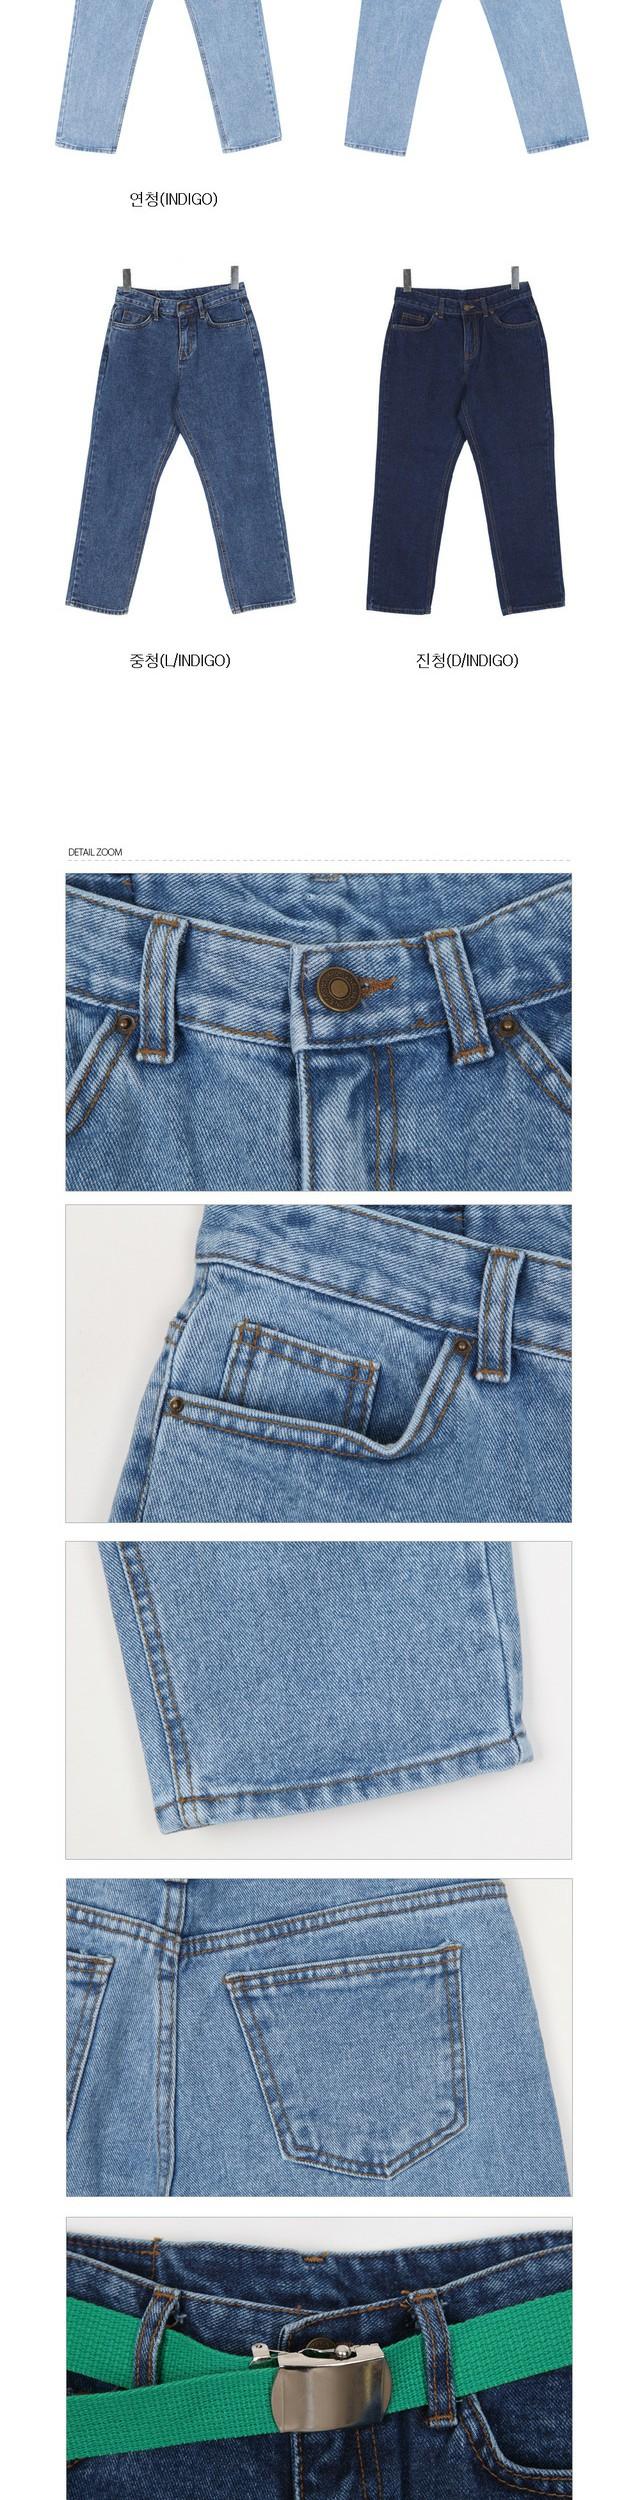 ★ P ★ denim cotton pants belt set spring